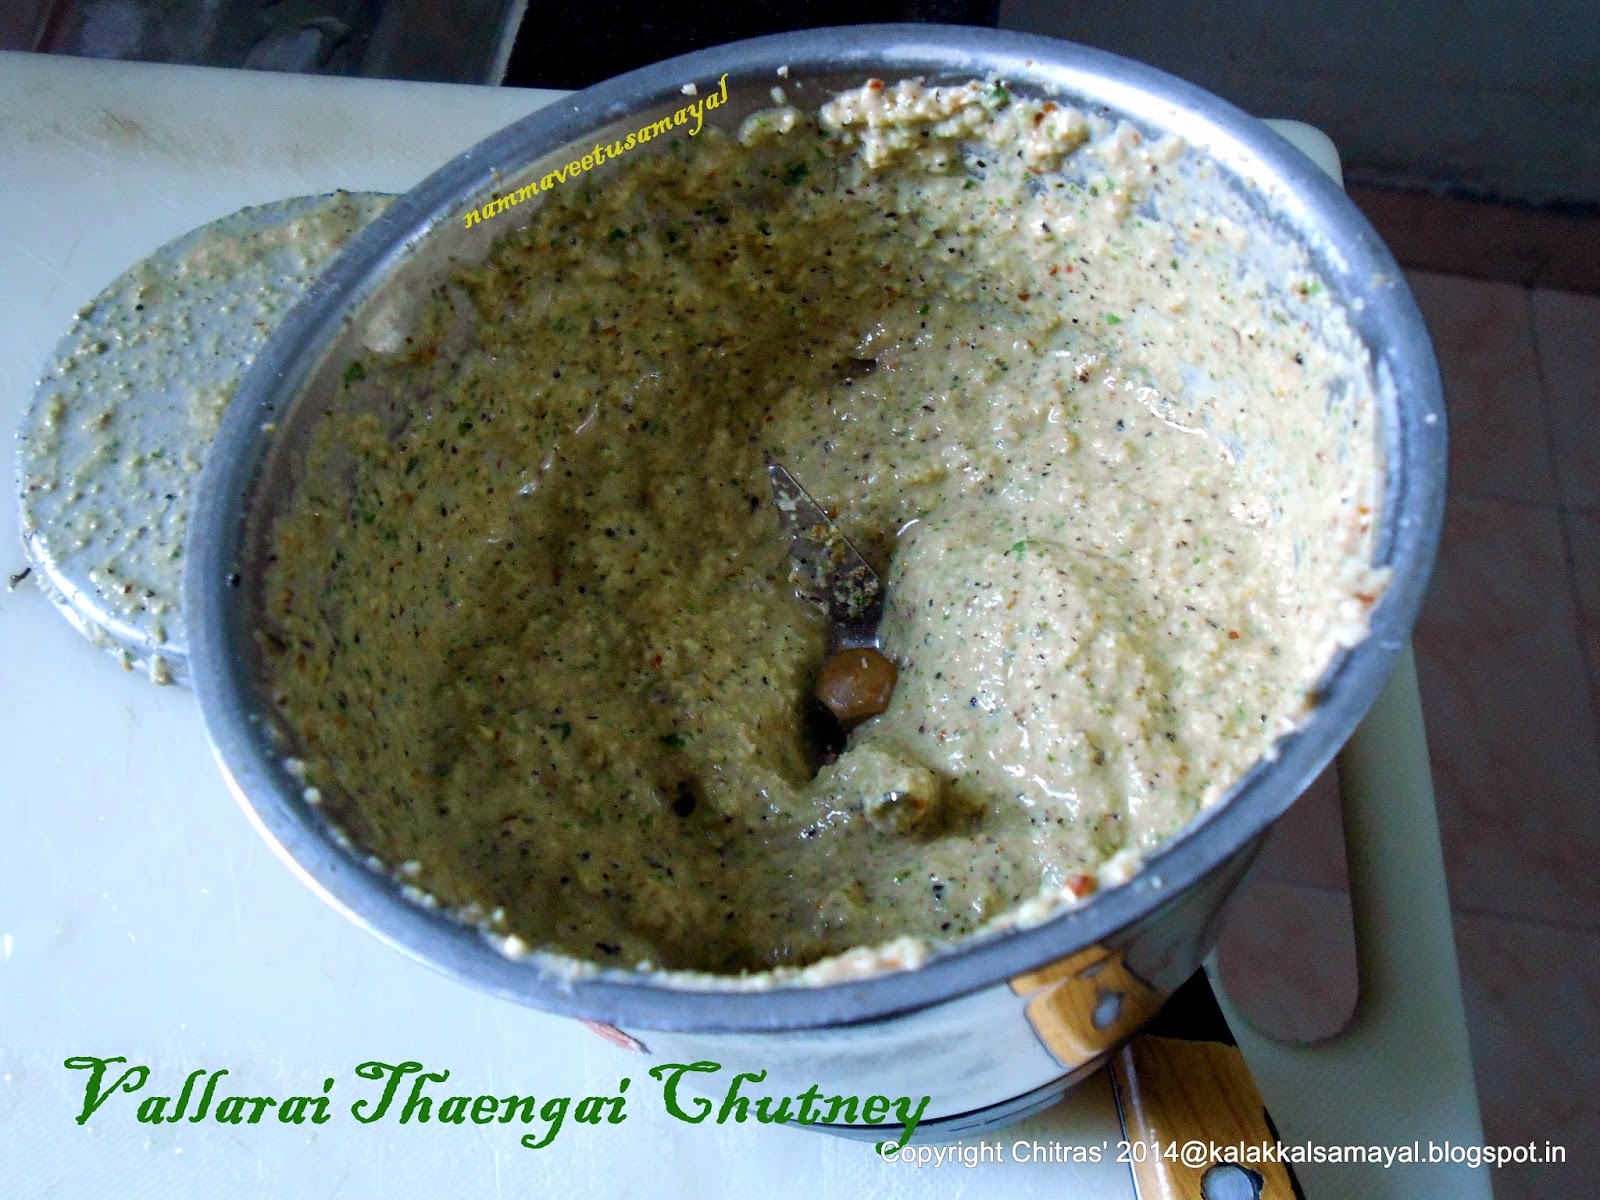 Vallarai Thaengai Chutney [ Centella Coconut Chutney ]